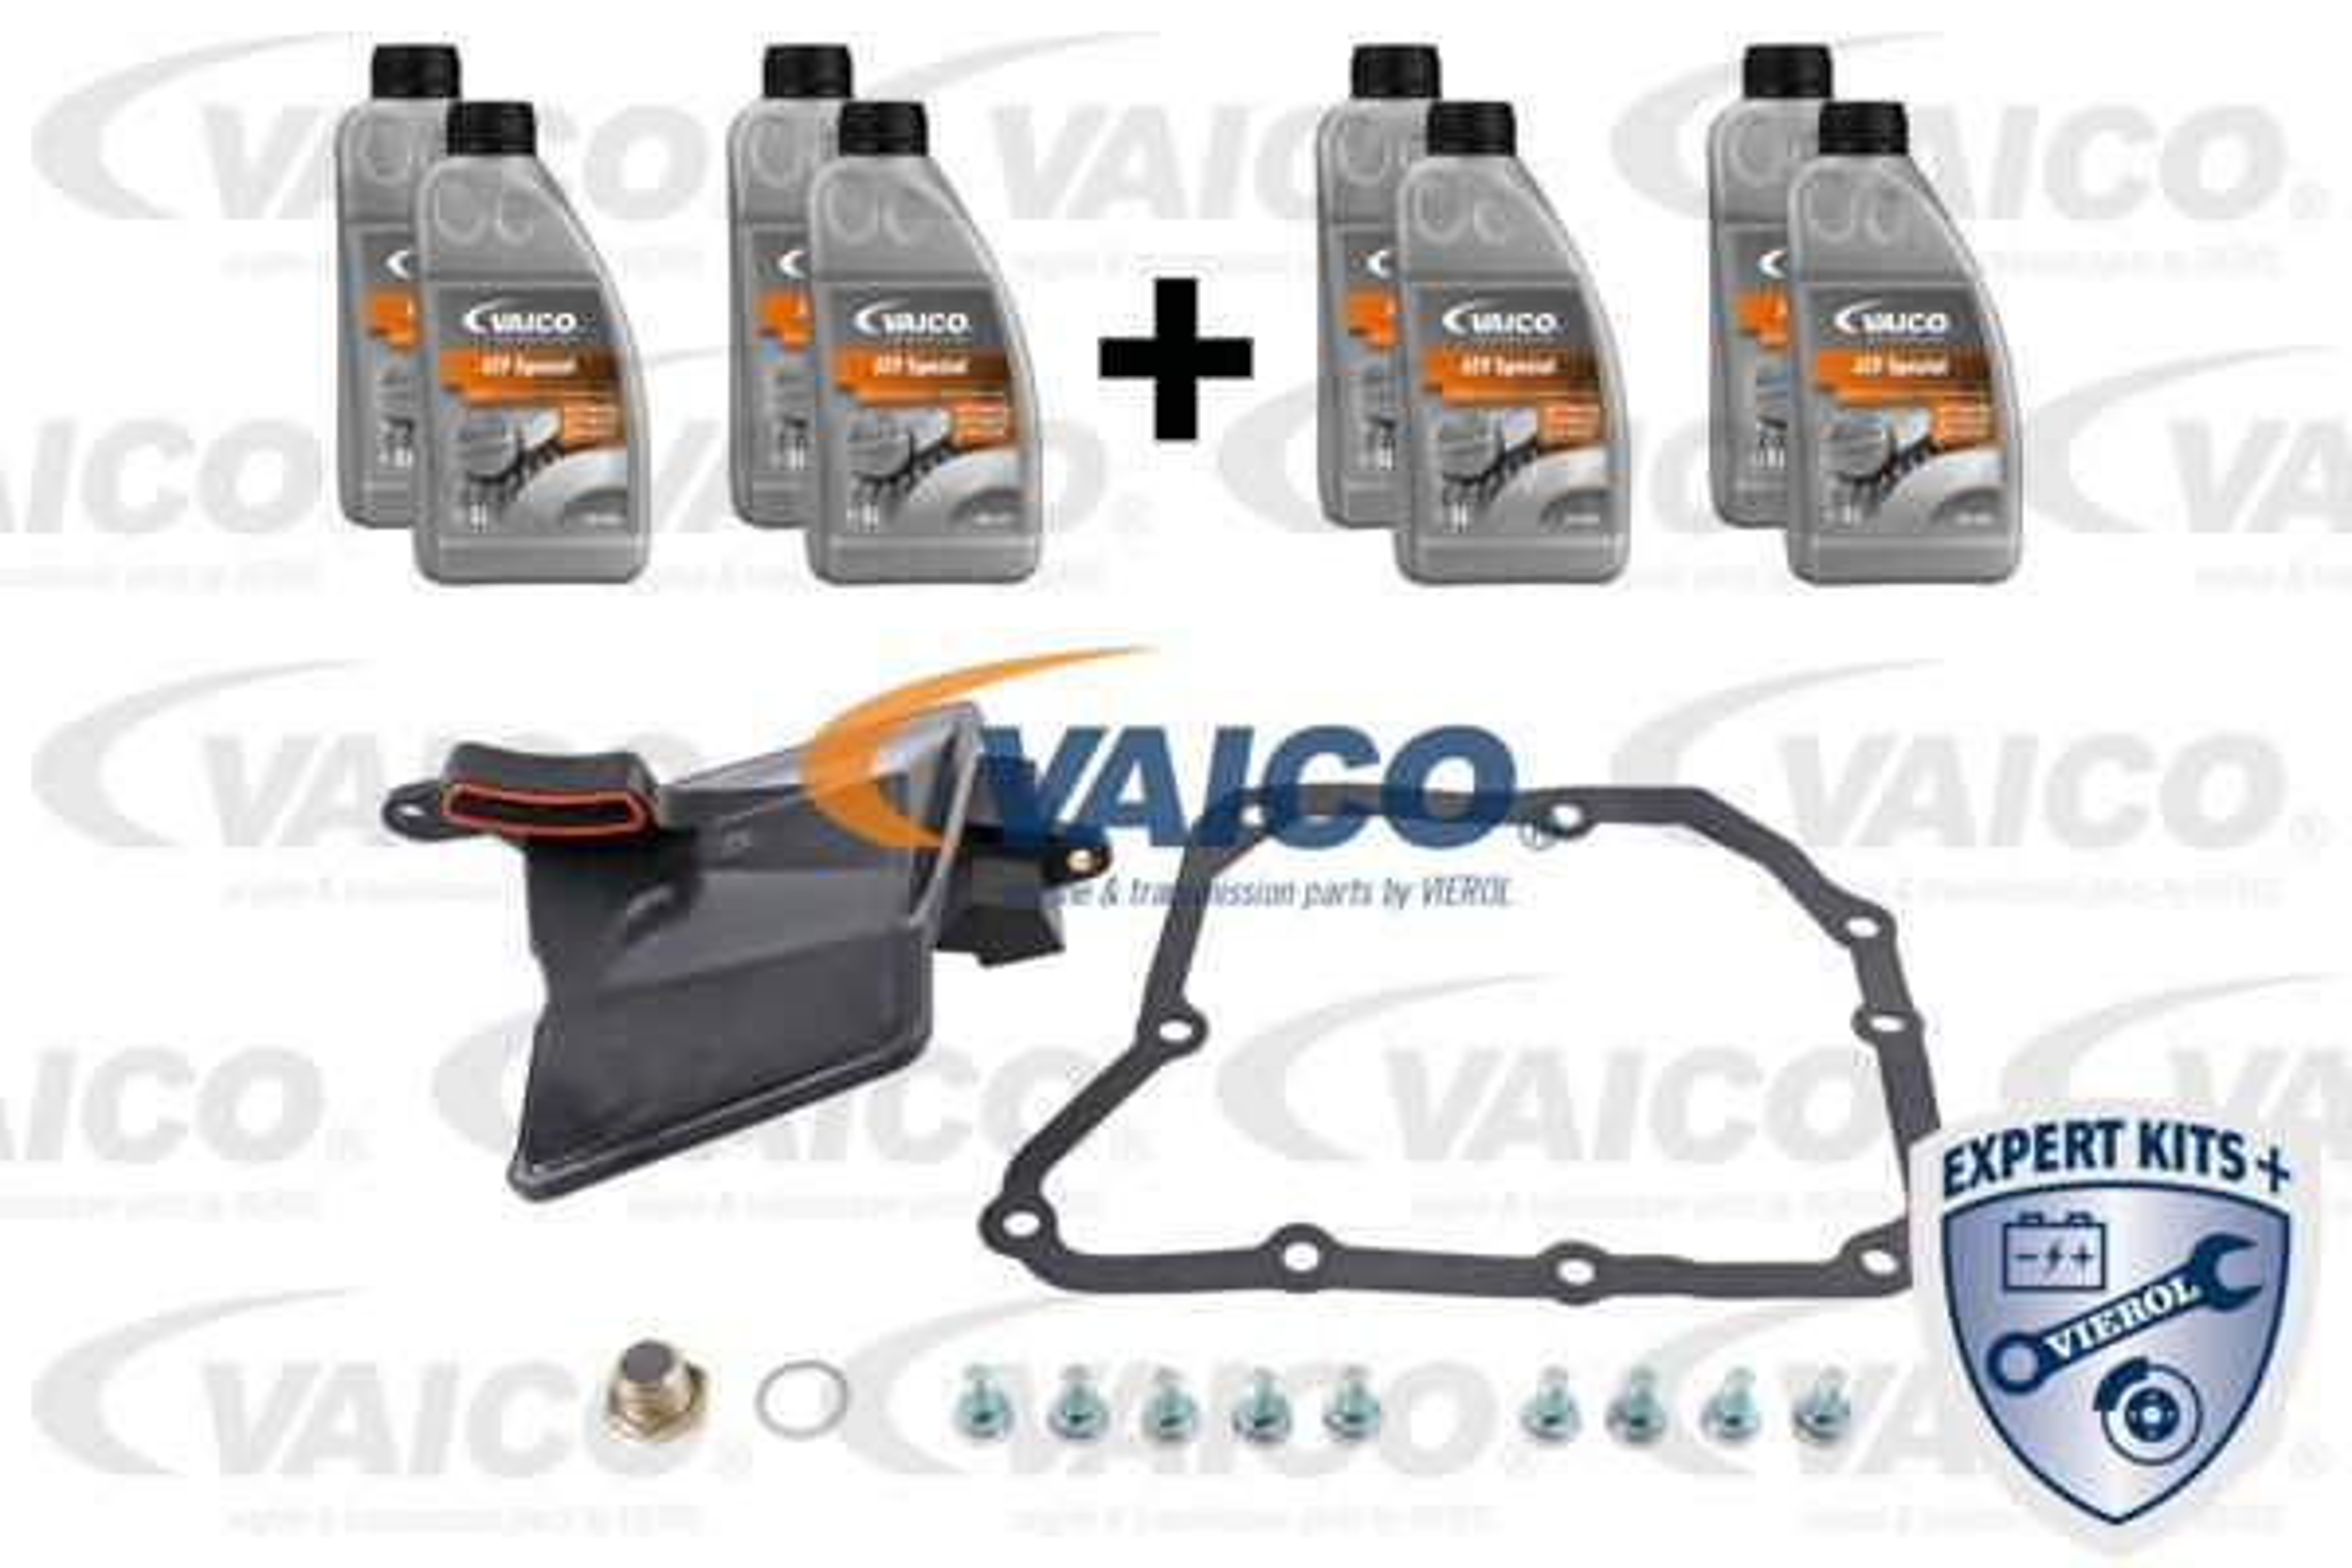 OPEL OMEGA 2002 Teilesatz, Ölwechsel-Automatikgetriebe - Original VAICO V40-1604-XXL